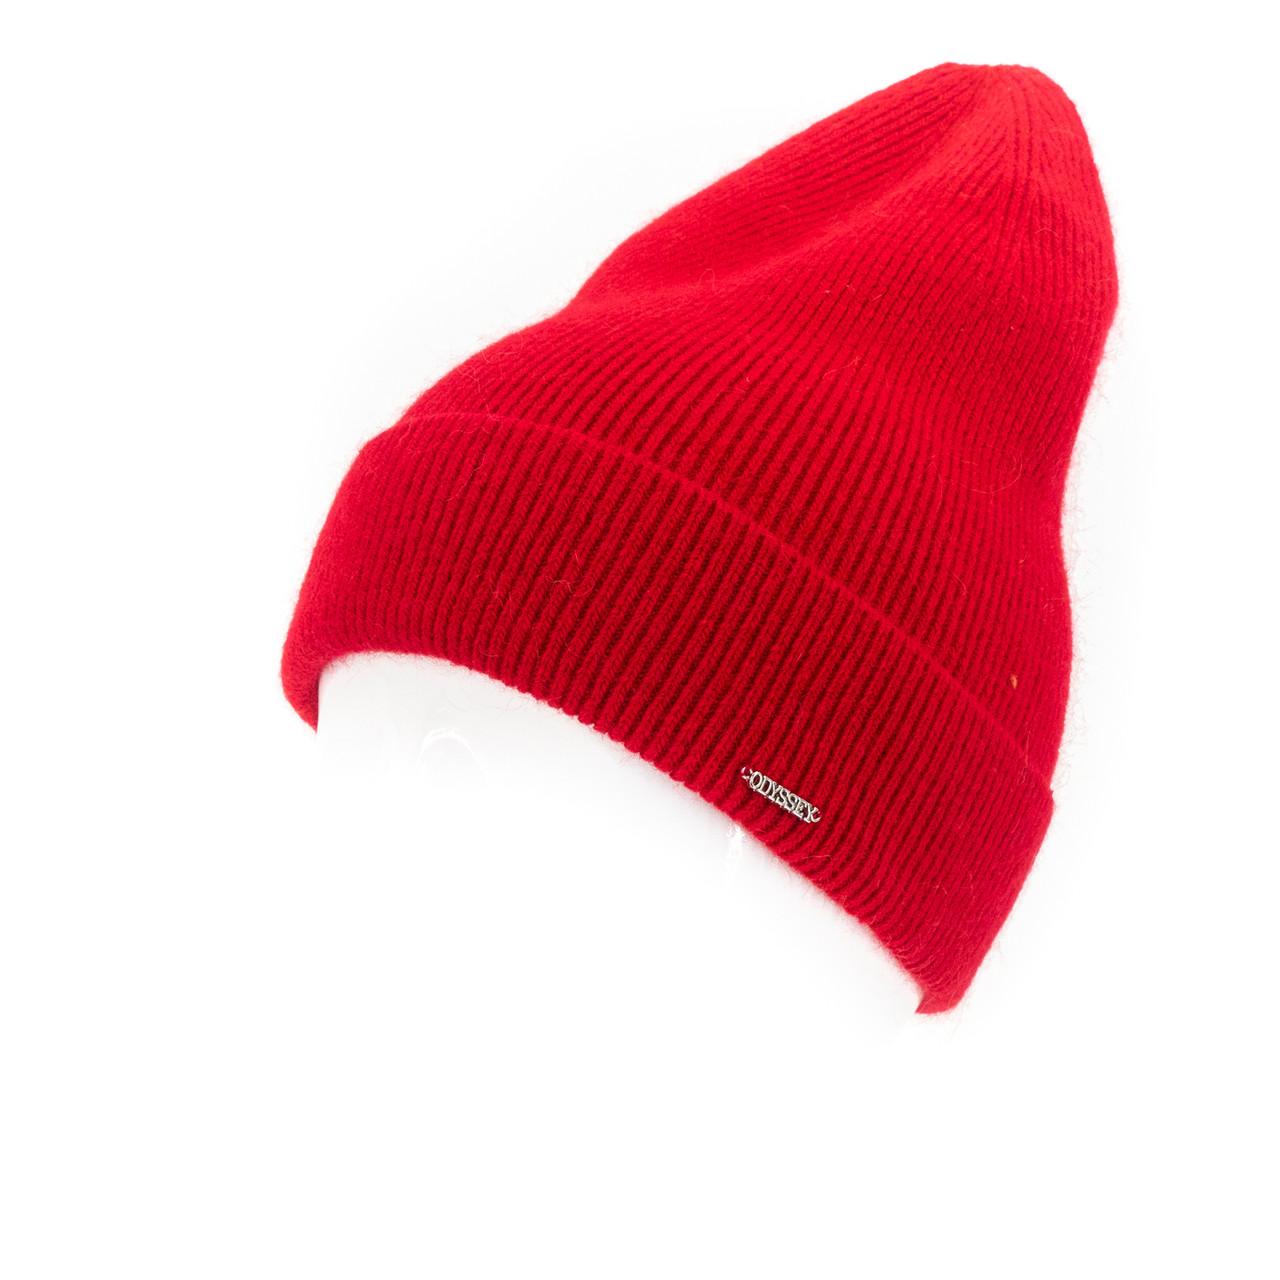 Шапка жіноча Odyssey Мажор червона ( 45561653 m )